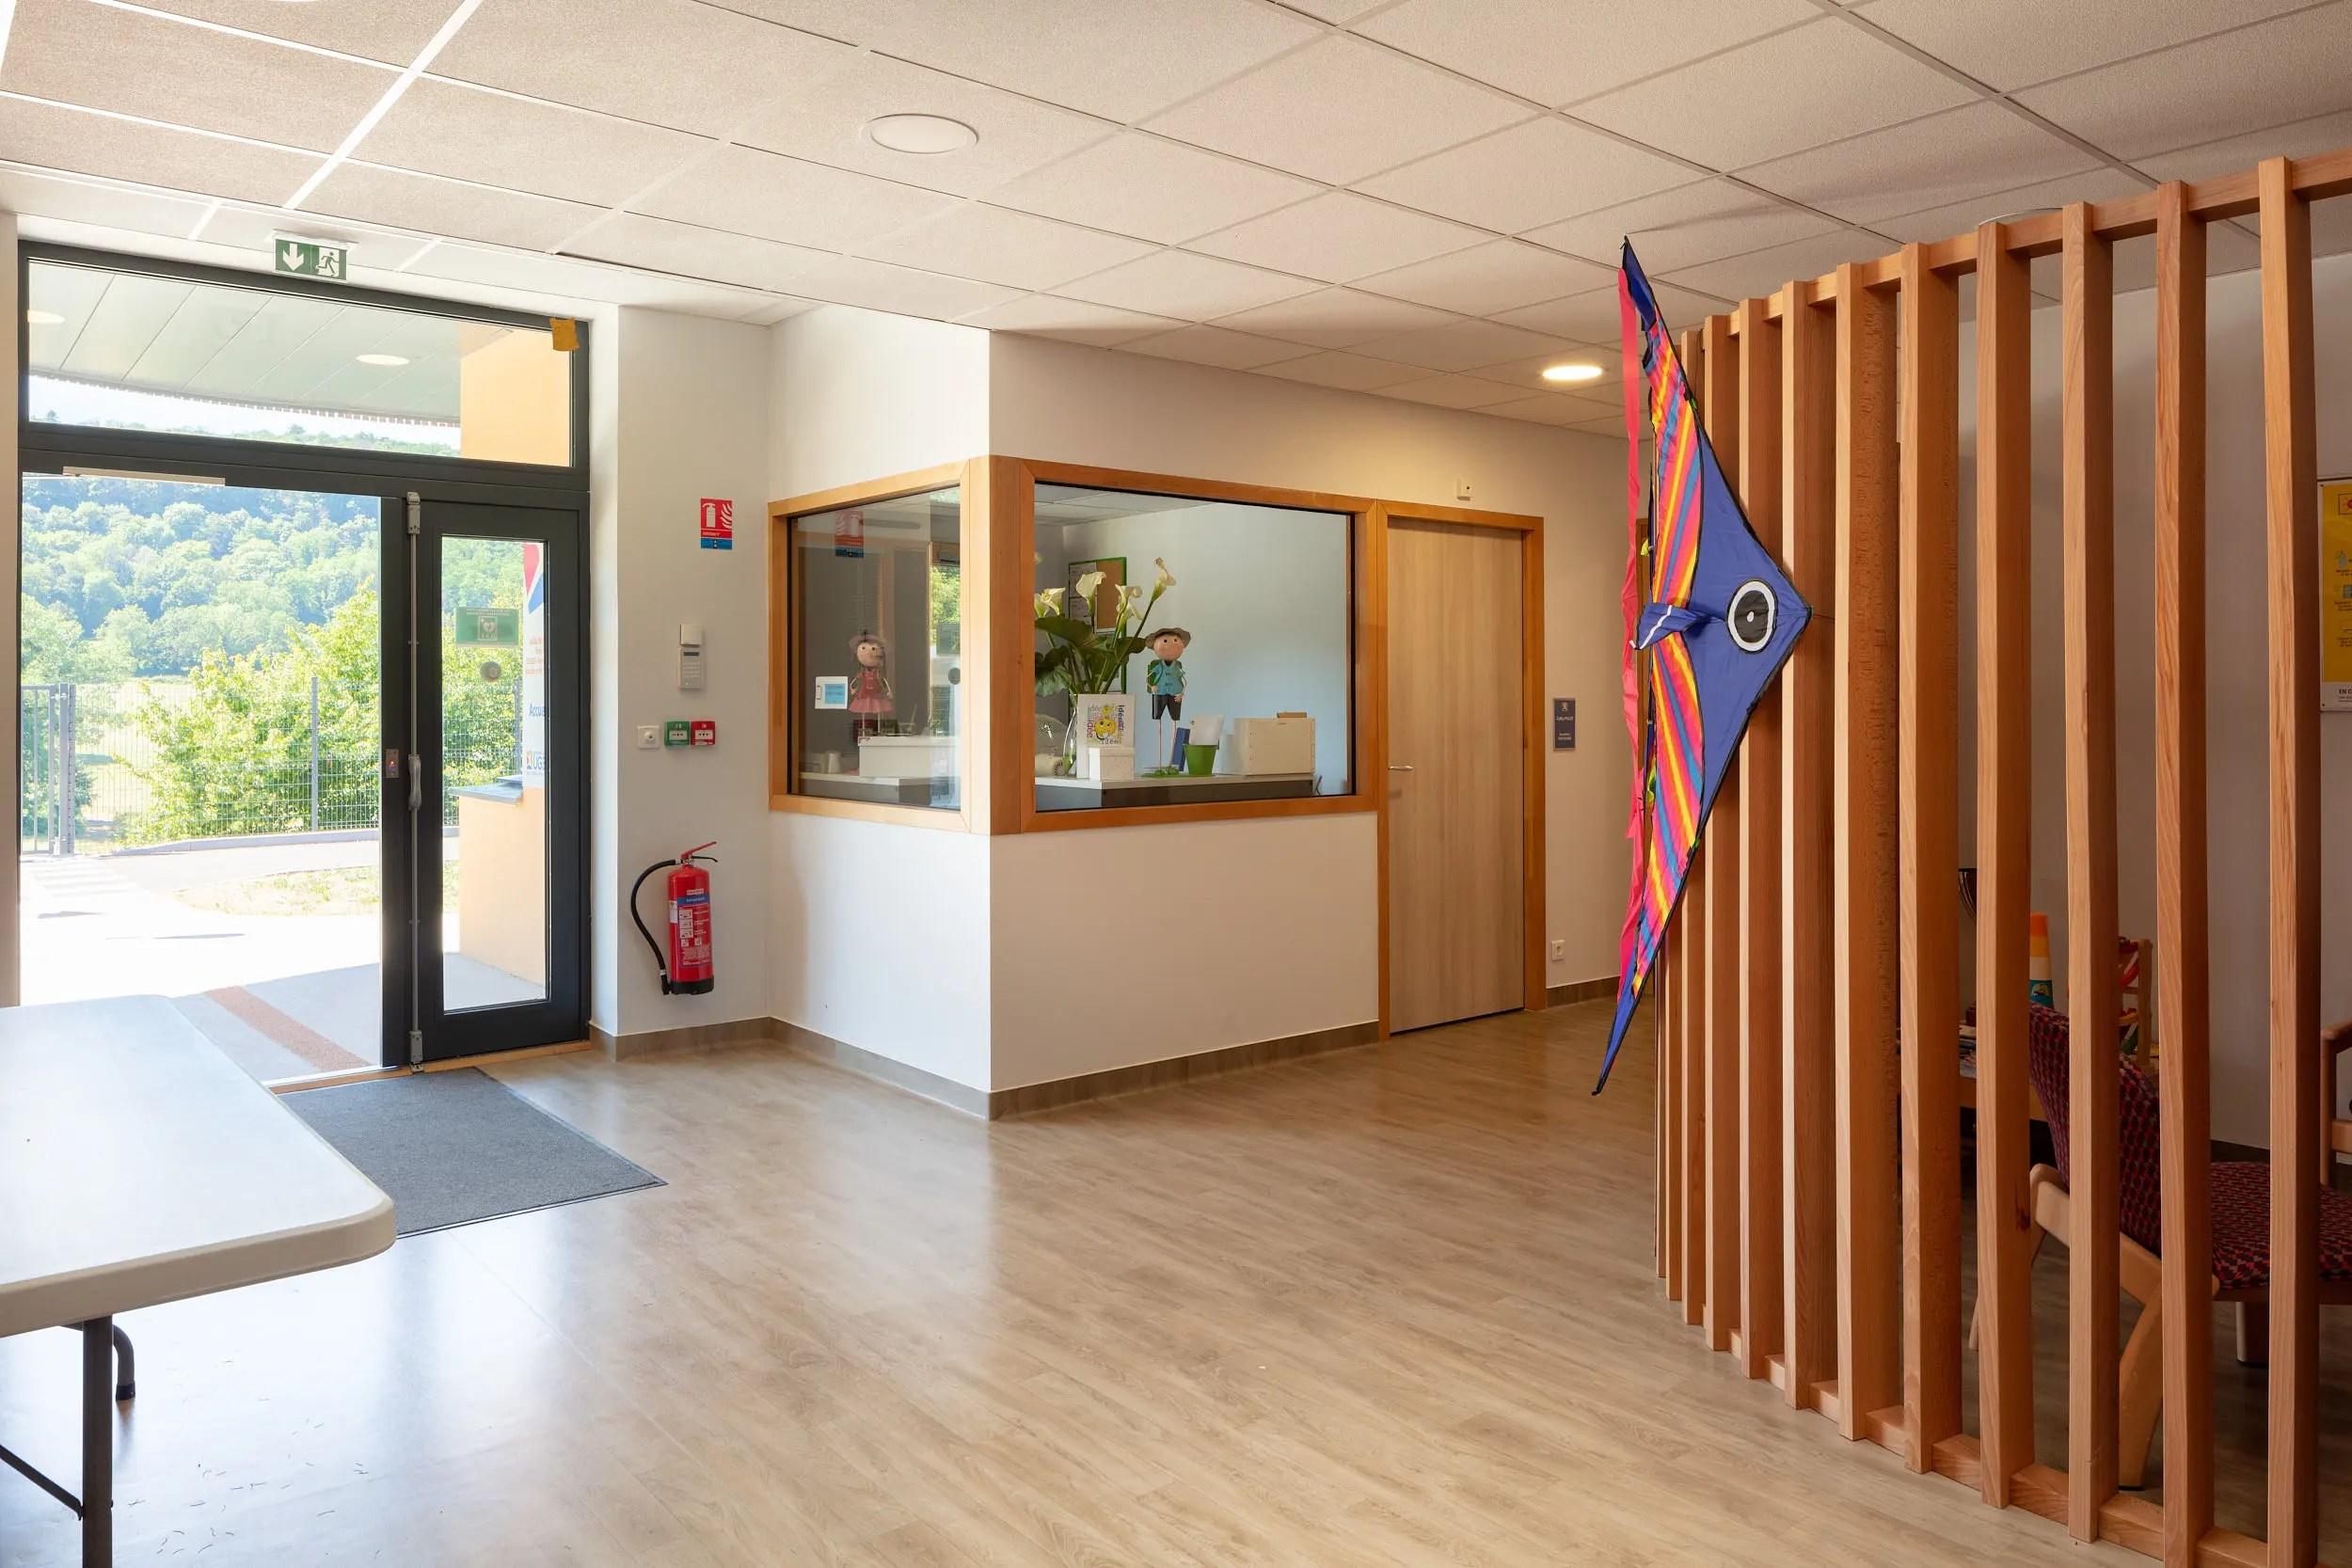 Lamboley Architecte Office